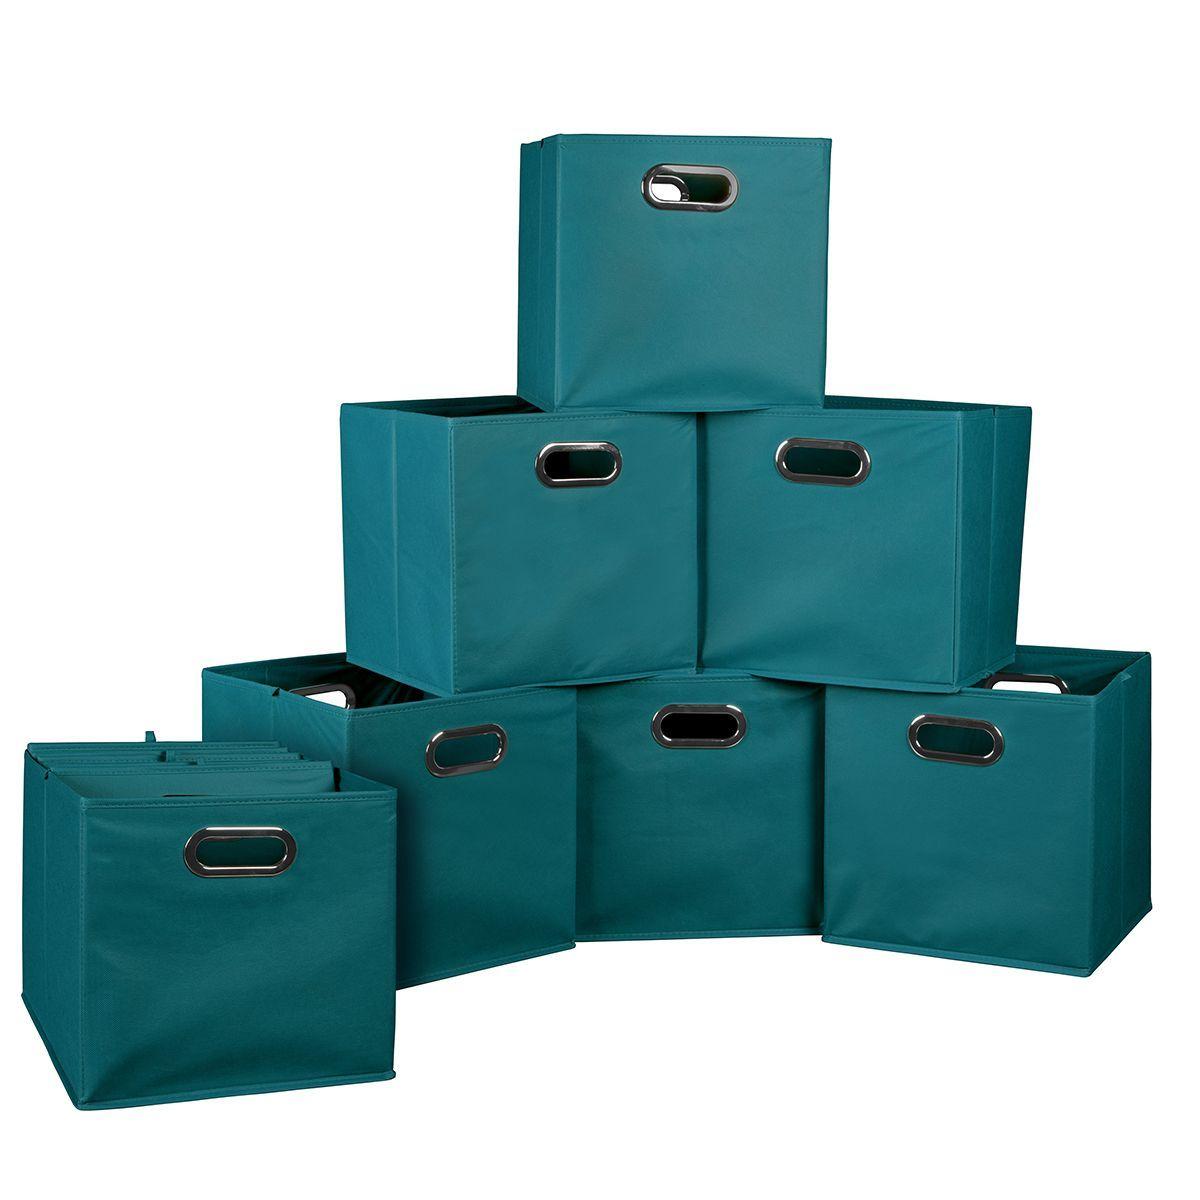 Regency Seating Niche Cubo Teal Fabric Foldable Storage Bins (Set Of 12   Teal)